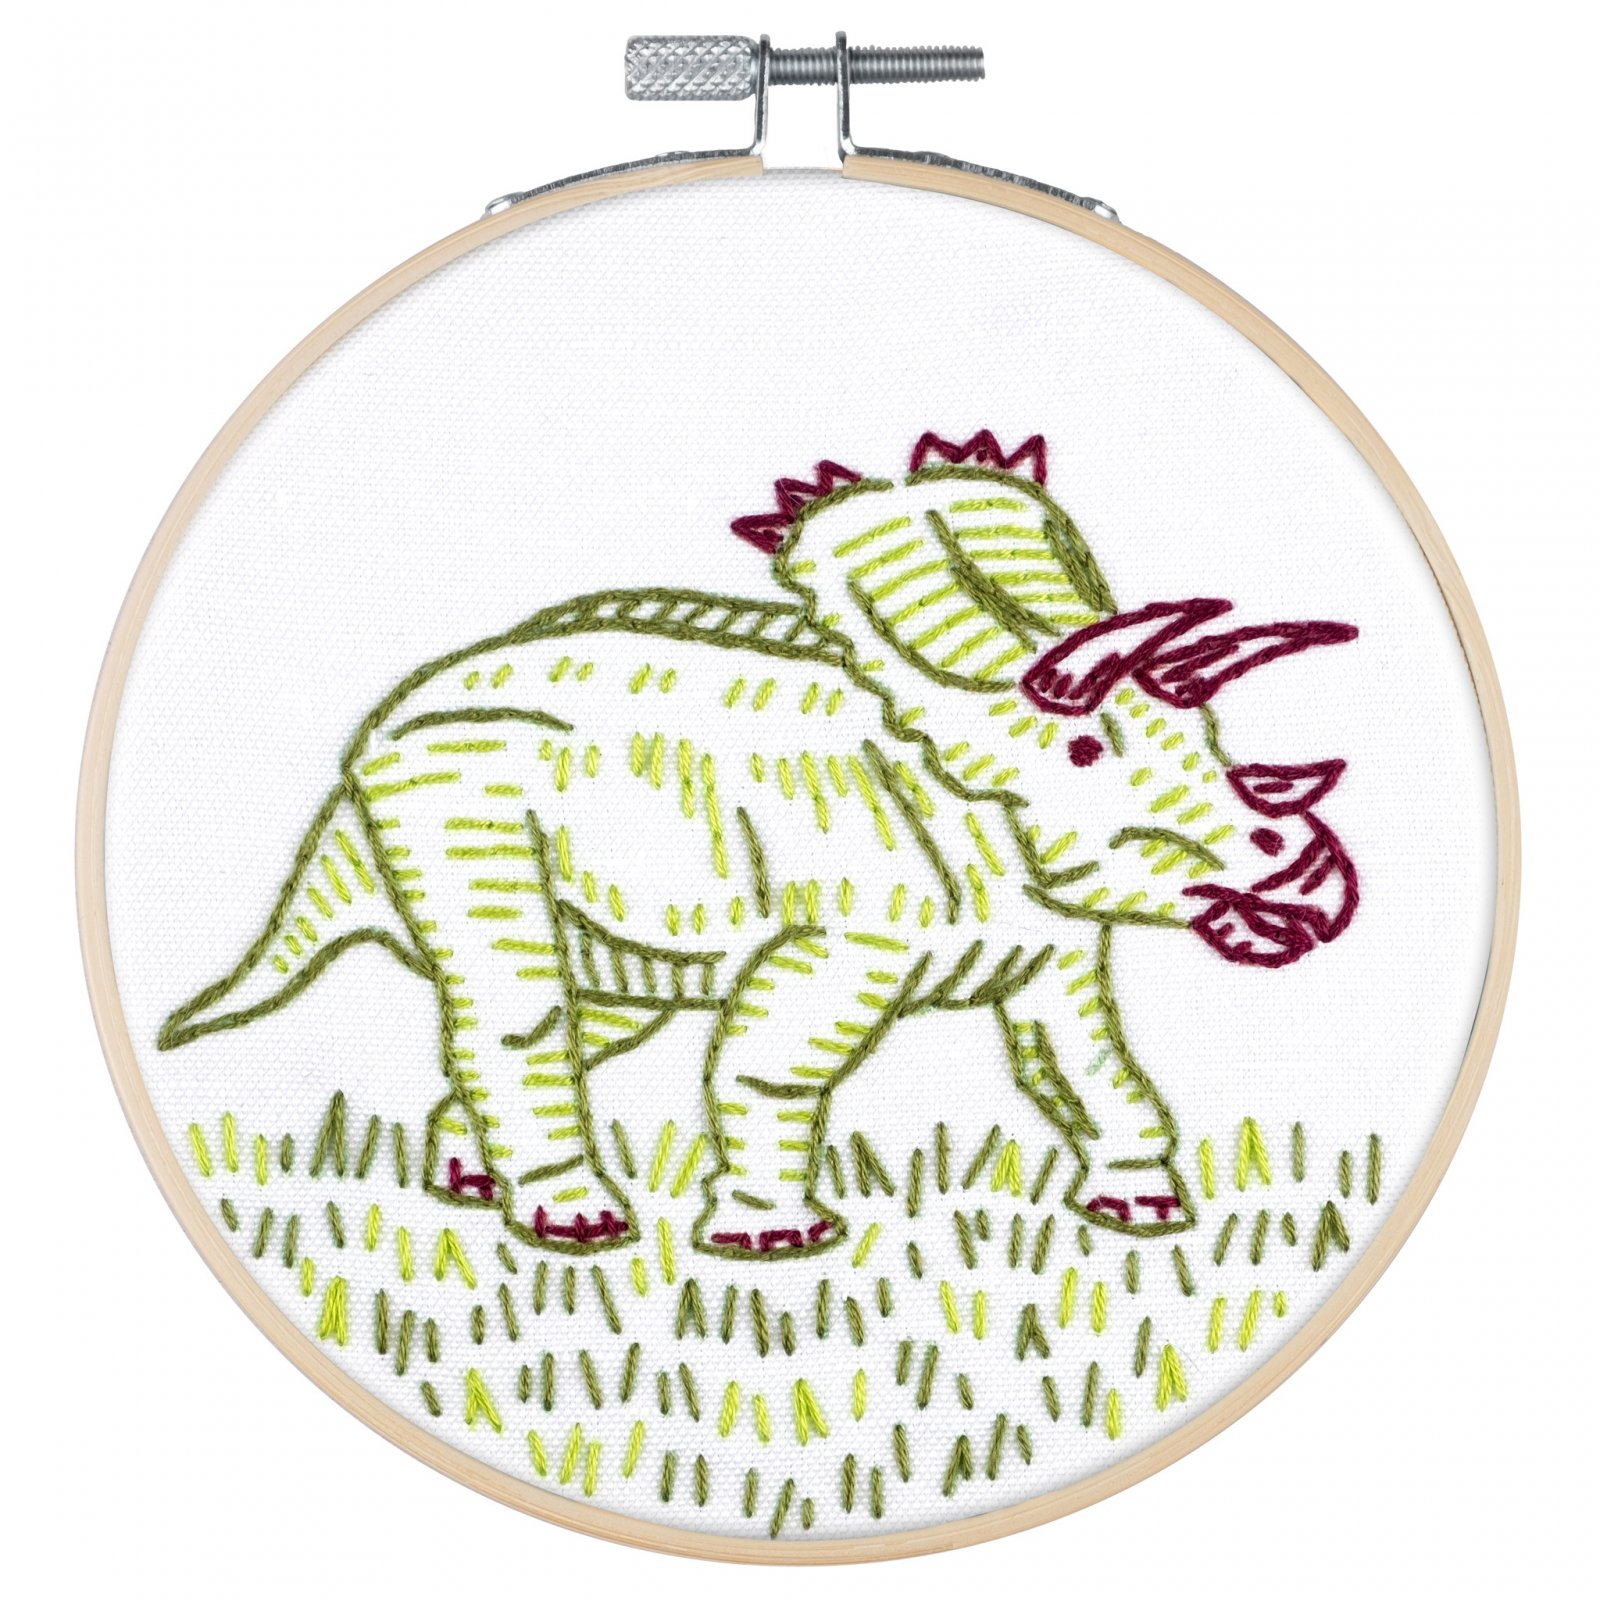 PopLush Embroidery Kit 5 - Dino-Mite!